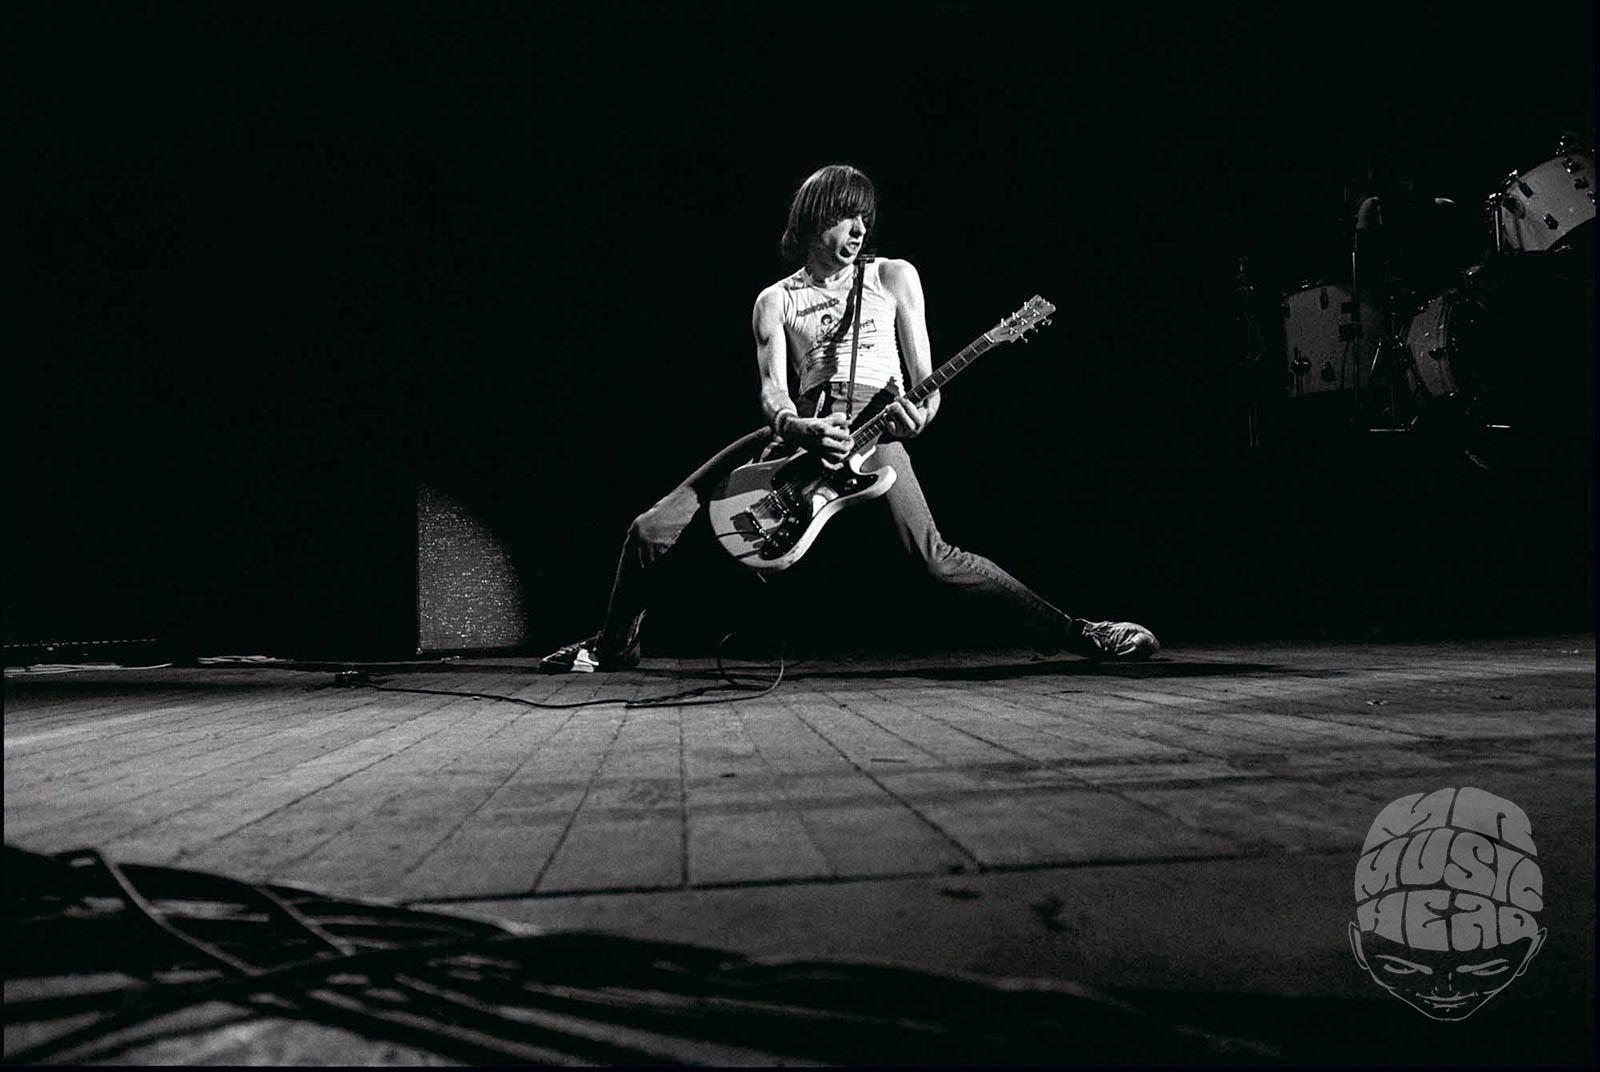 david corio_Johnny Ramone.jpg